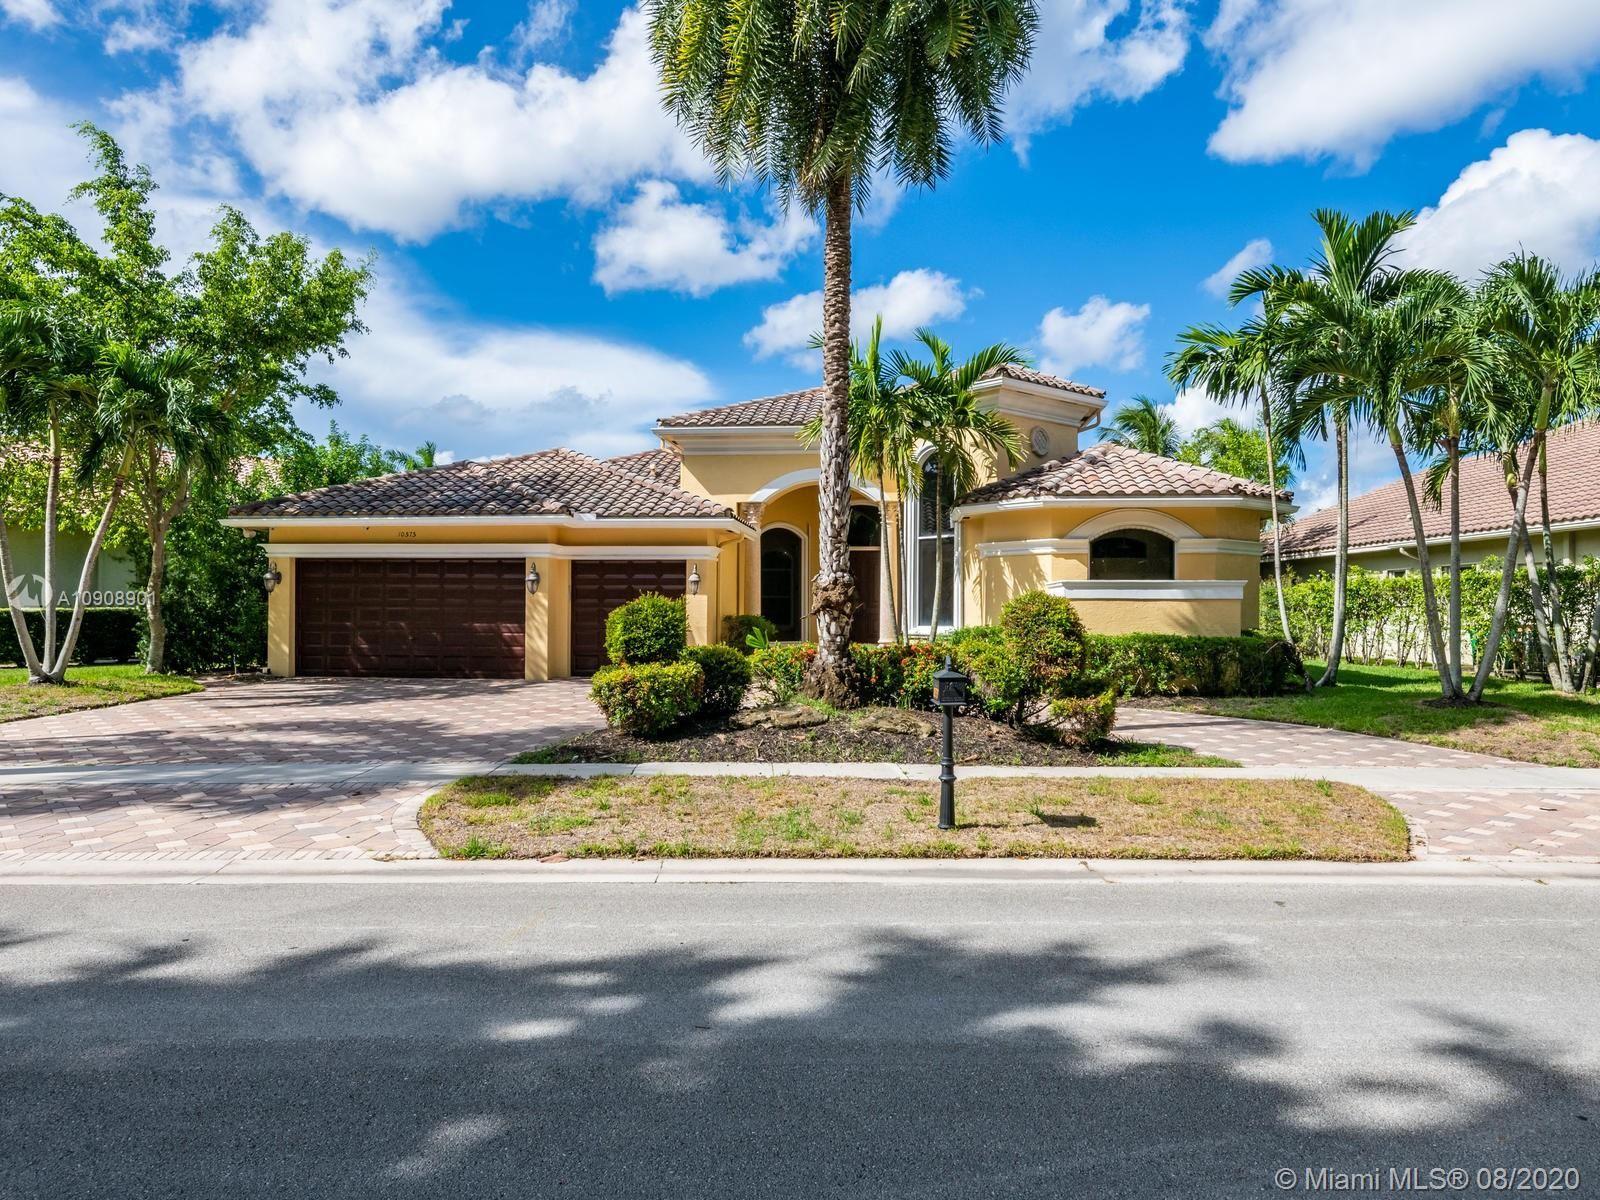 10575 Blue Palm St, Plantation, FL 33324 - #: A10908901